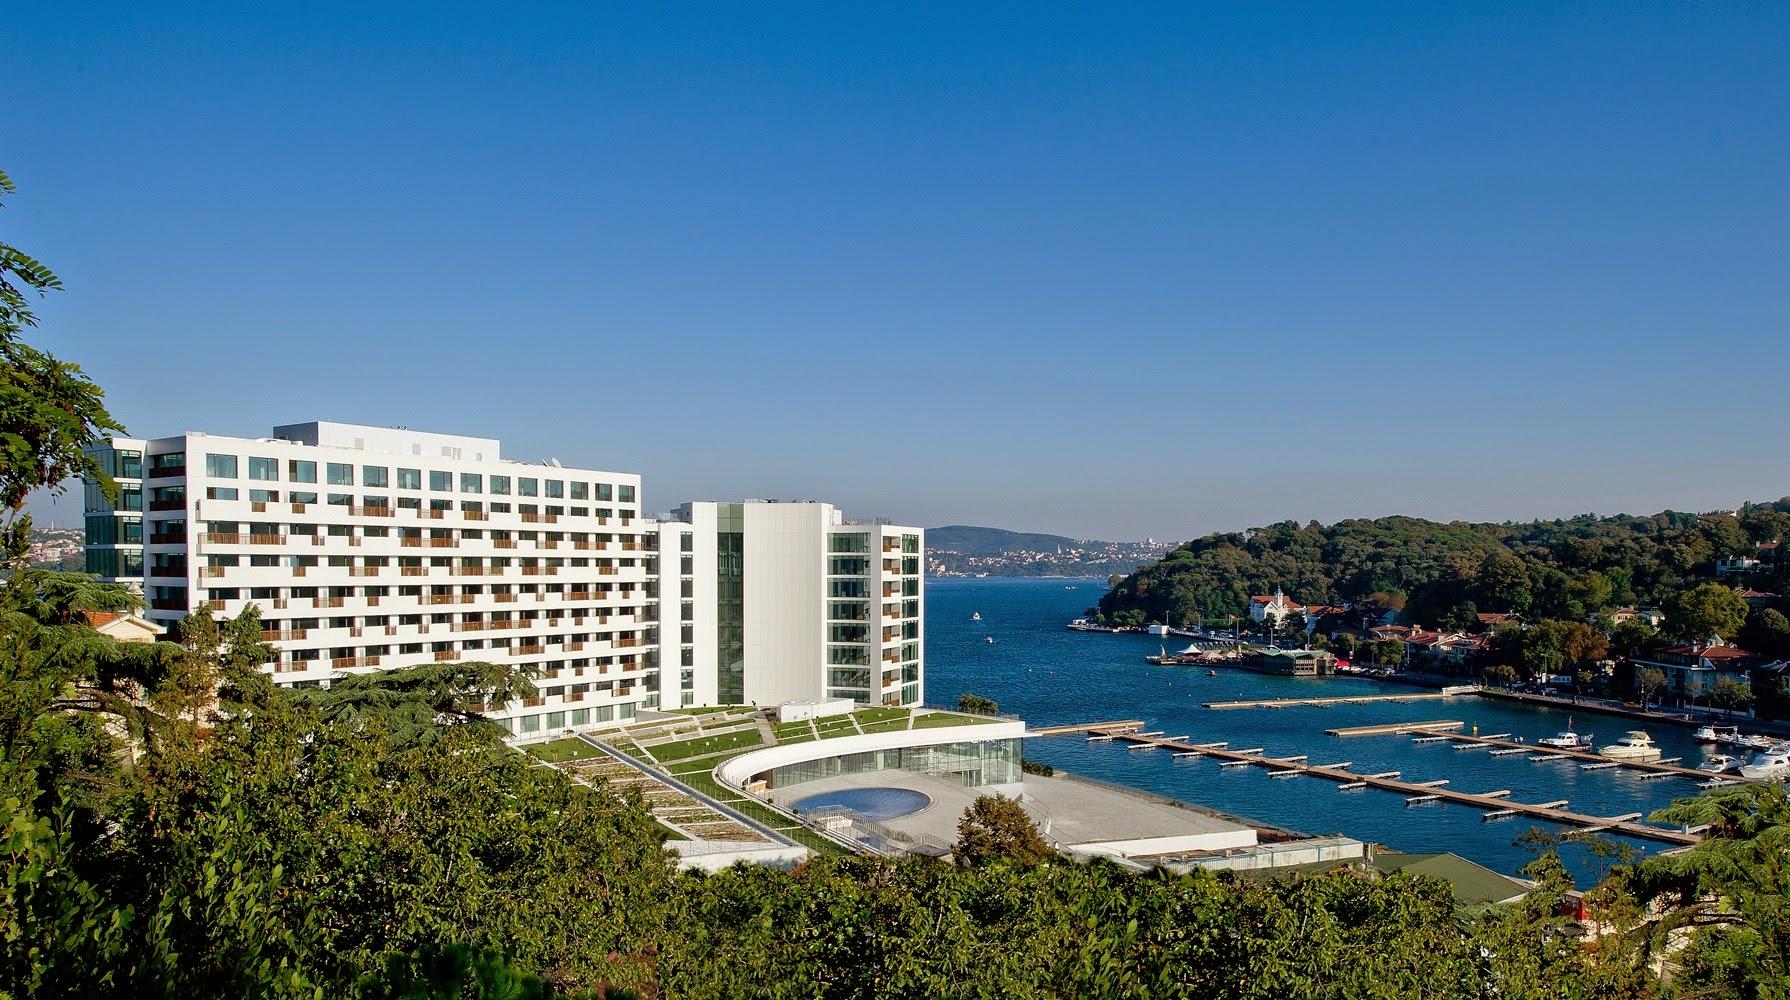 grand tarabya hotel bosphorus istanbul